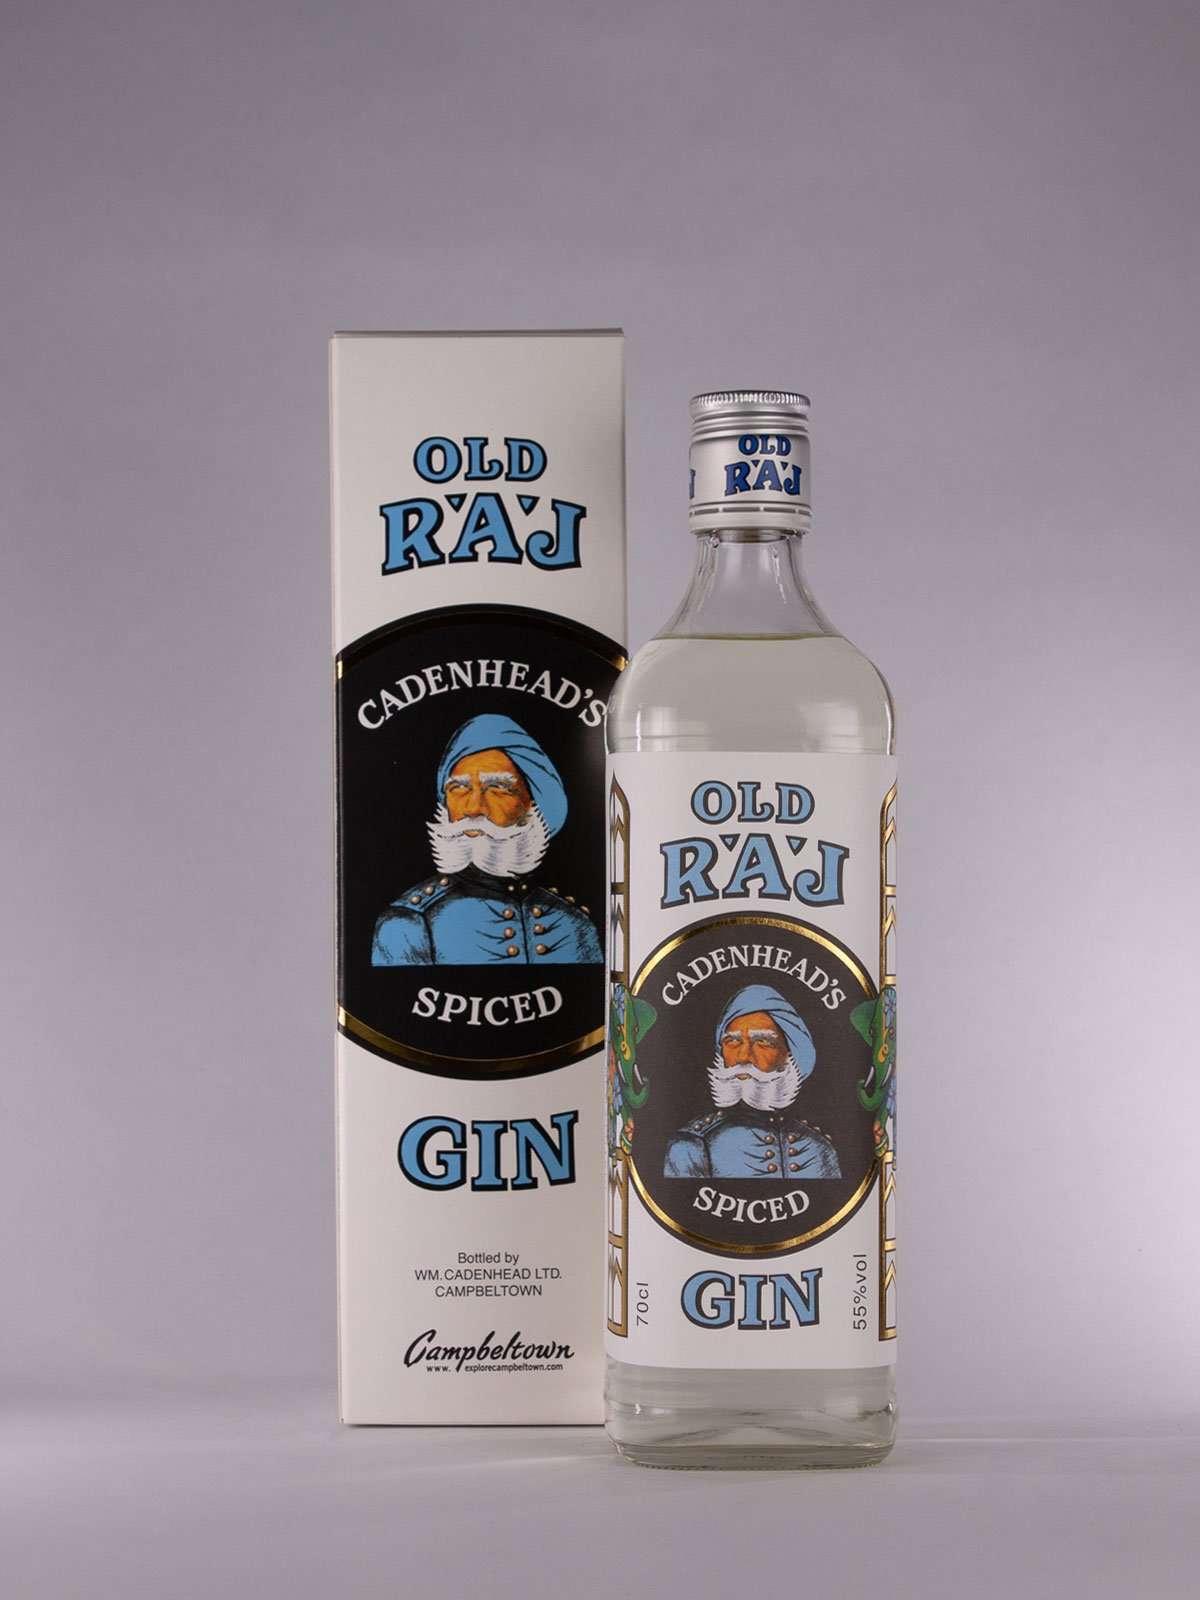 Old Raj Spiced Gin